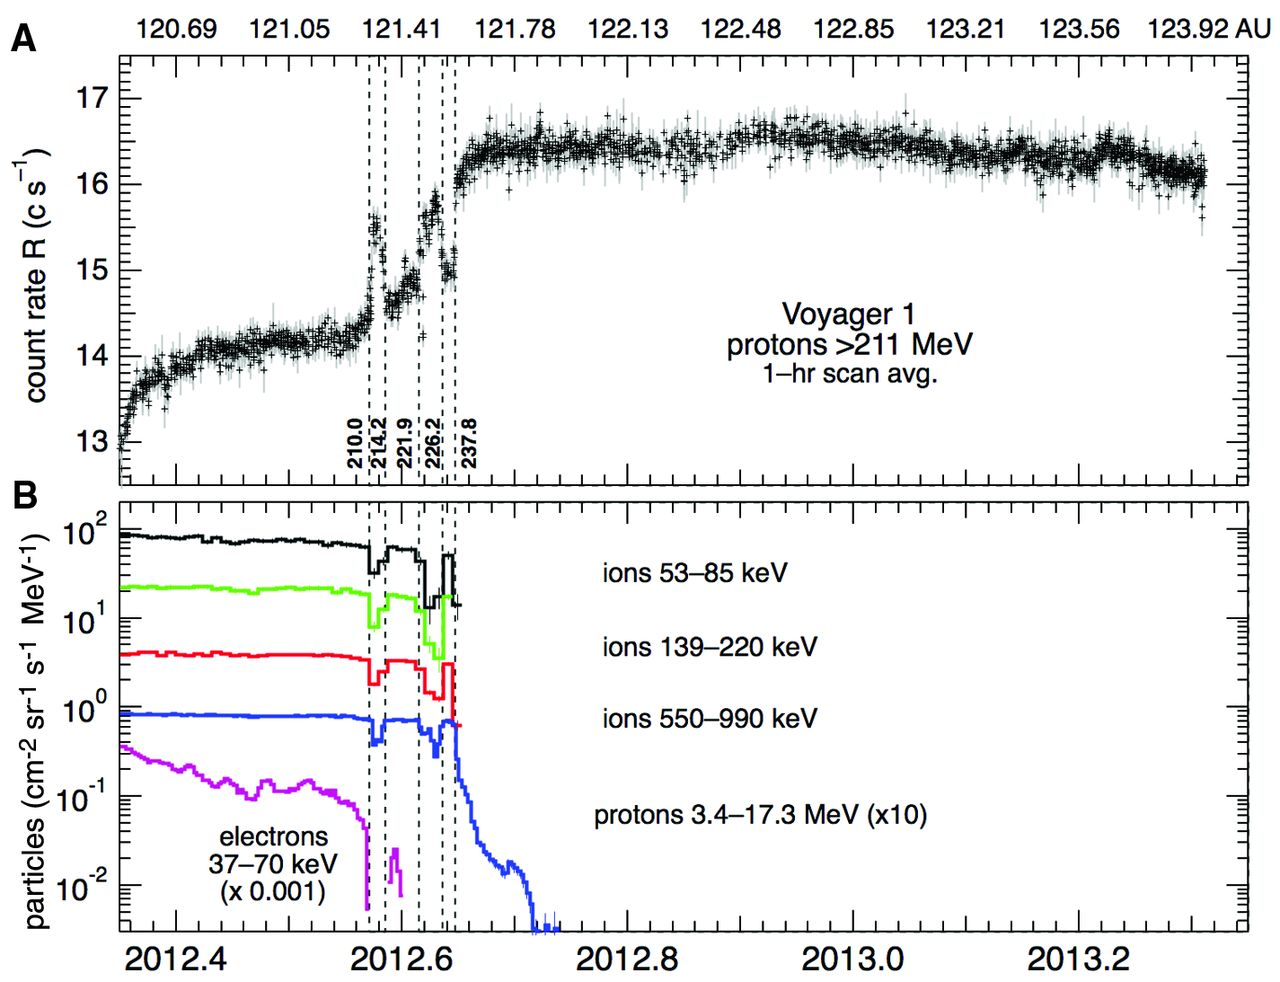 Dibujo20130701 Voyager-1 signal last year